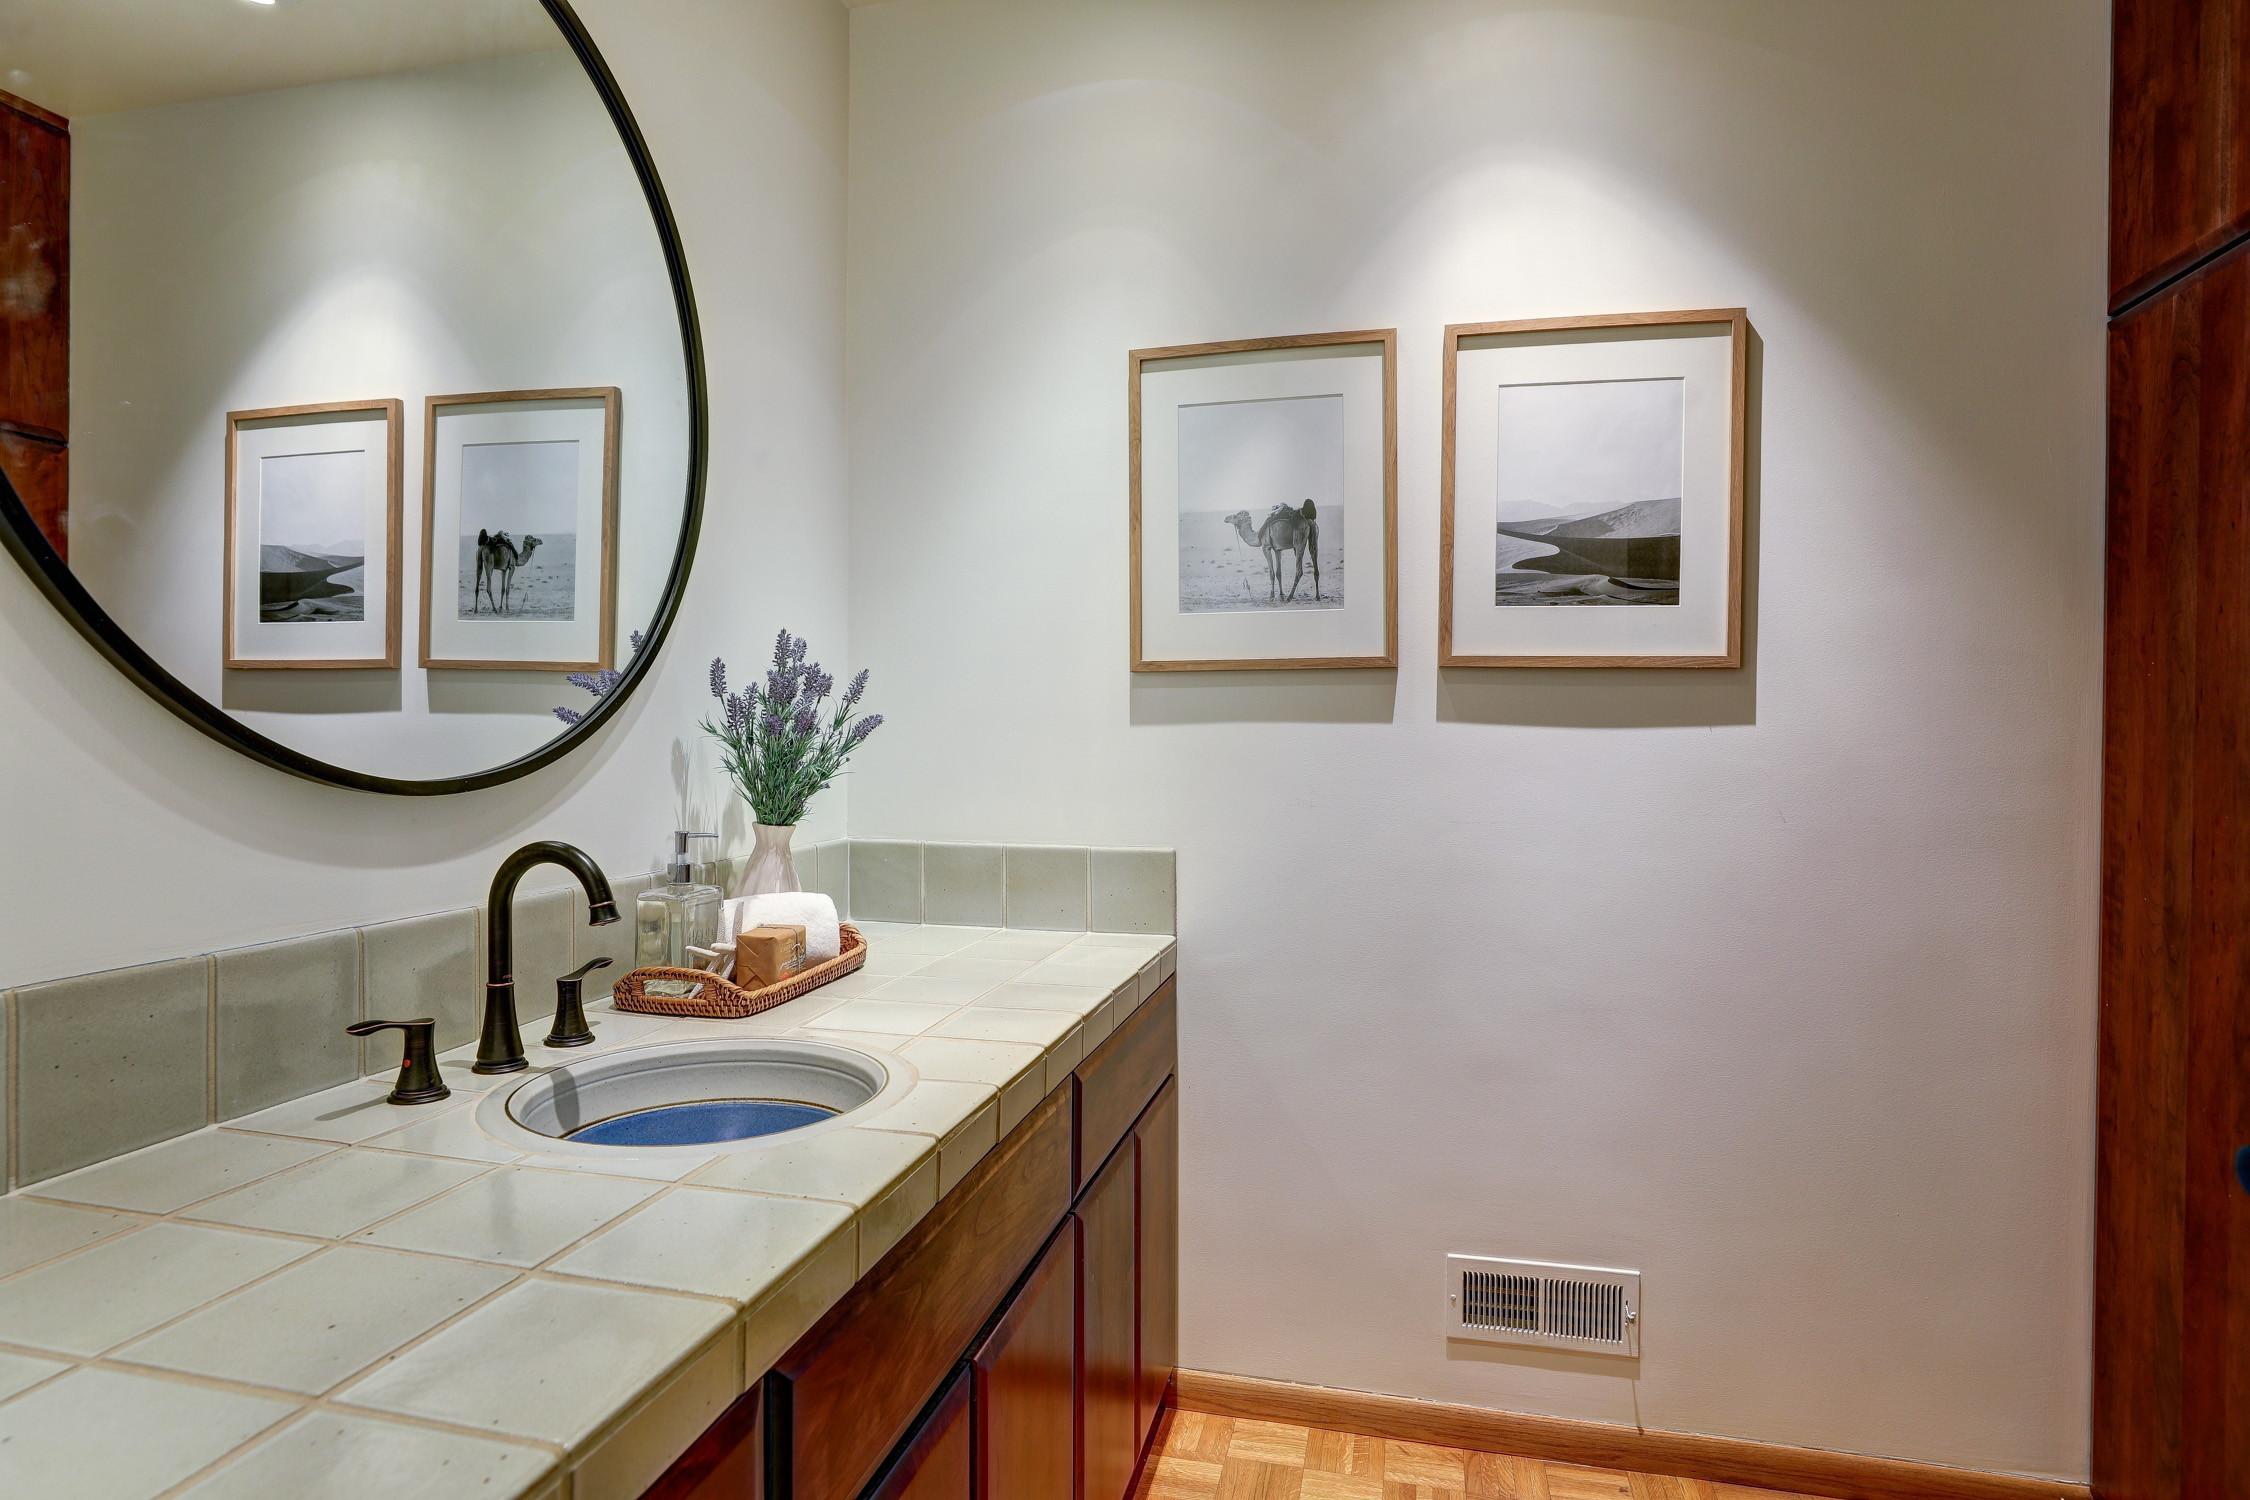 16Dorian 32 MLSSan Rafael Real Estate - Listed by Julia Fitzpatrick + Allie Fornesi Team Own Marin County .jpg